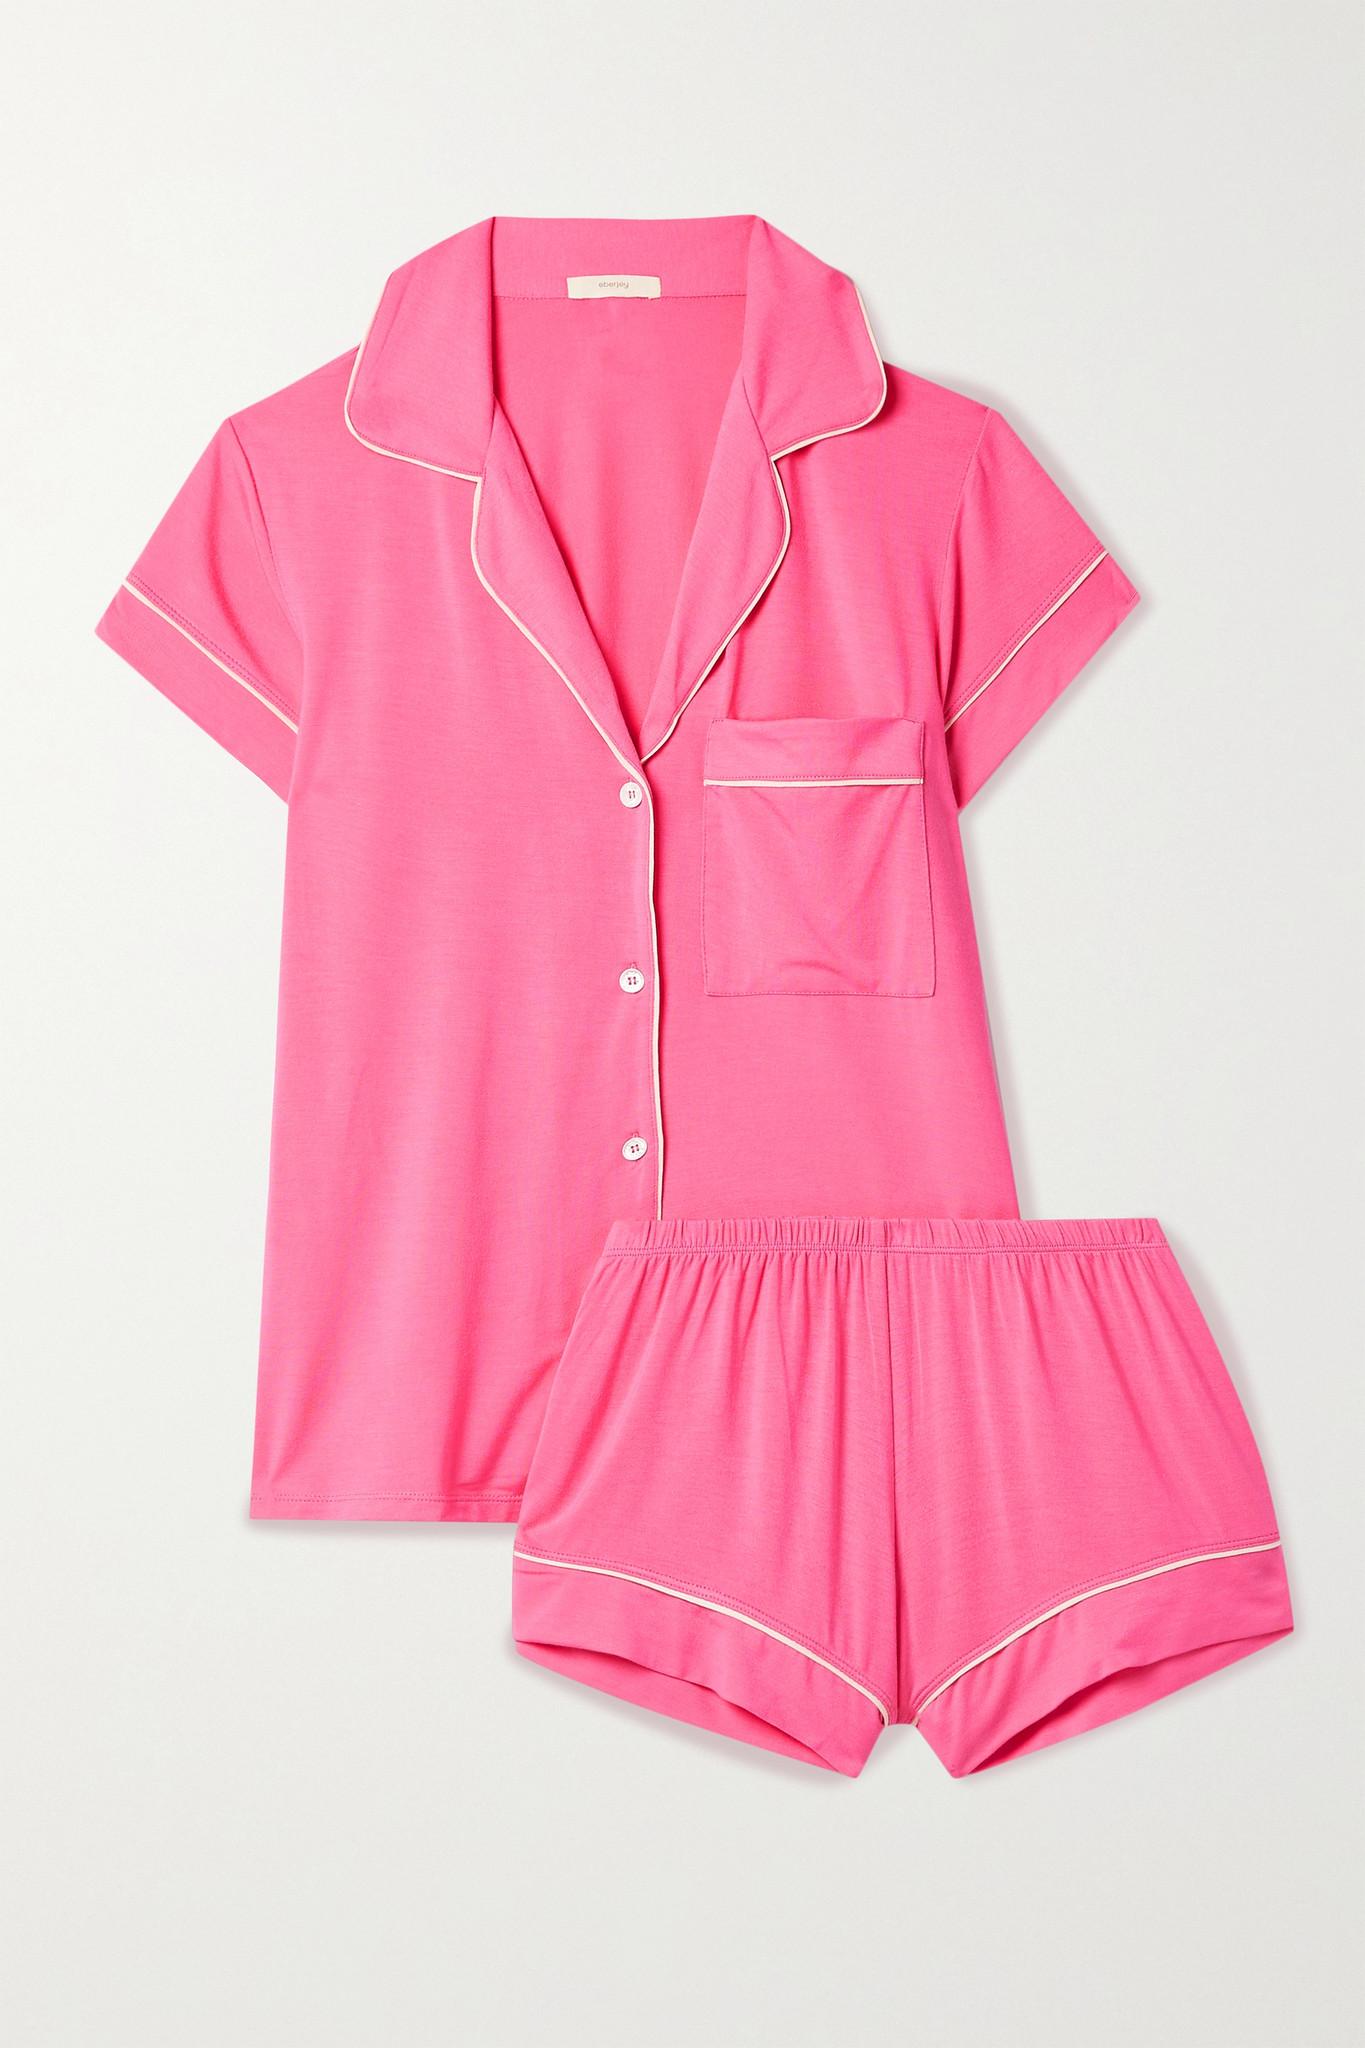 EBERJEY - Gisele Piped Stretch-modal Pajama Set - Pink - x large